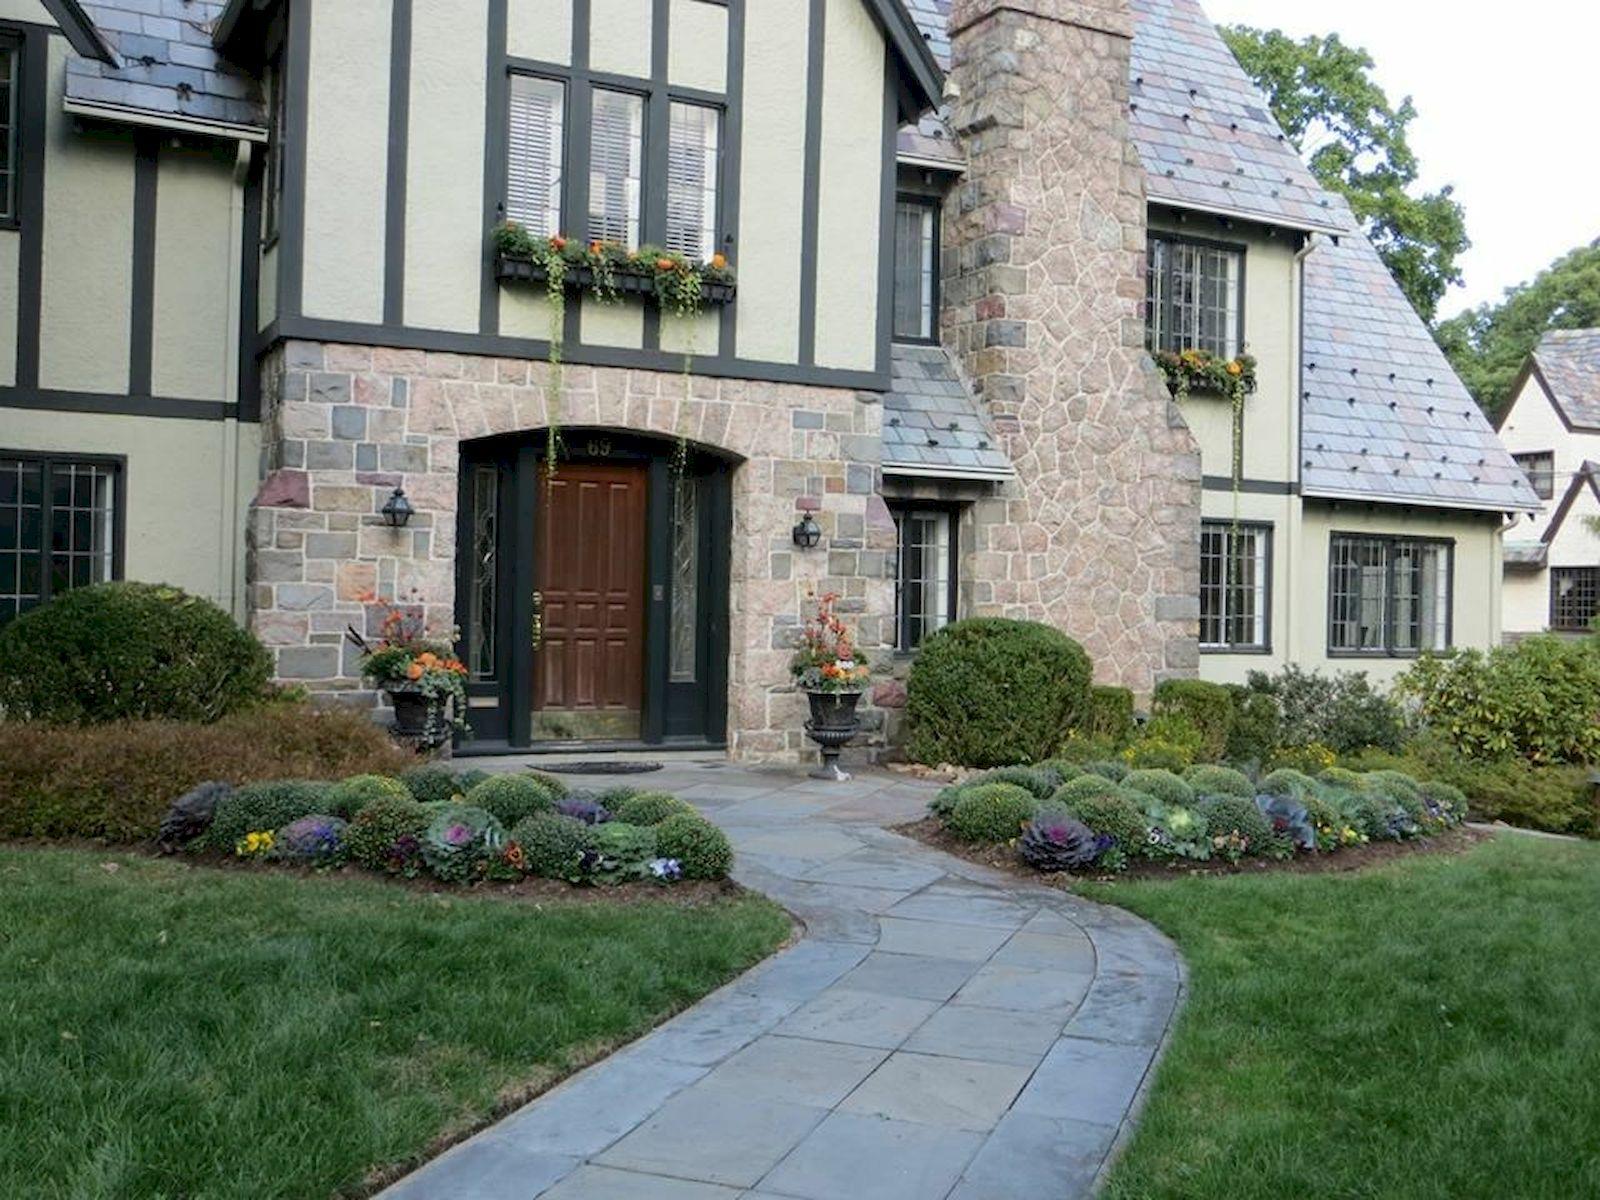 70 Stunning Exterior House Design Ideas (49)